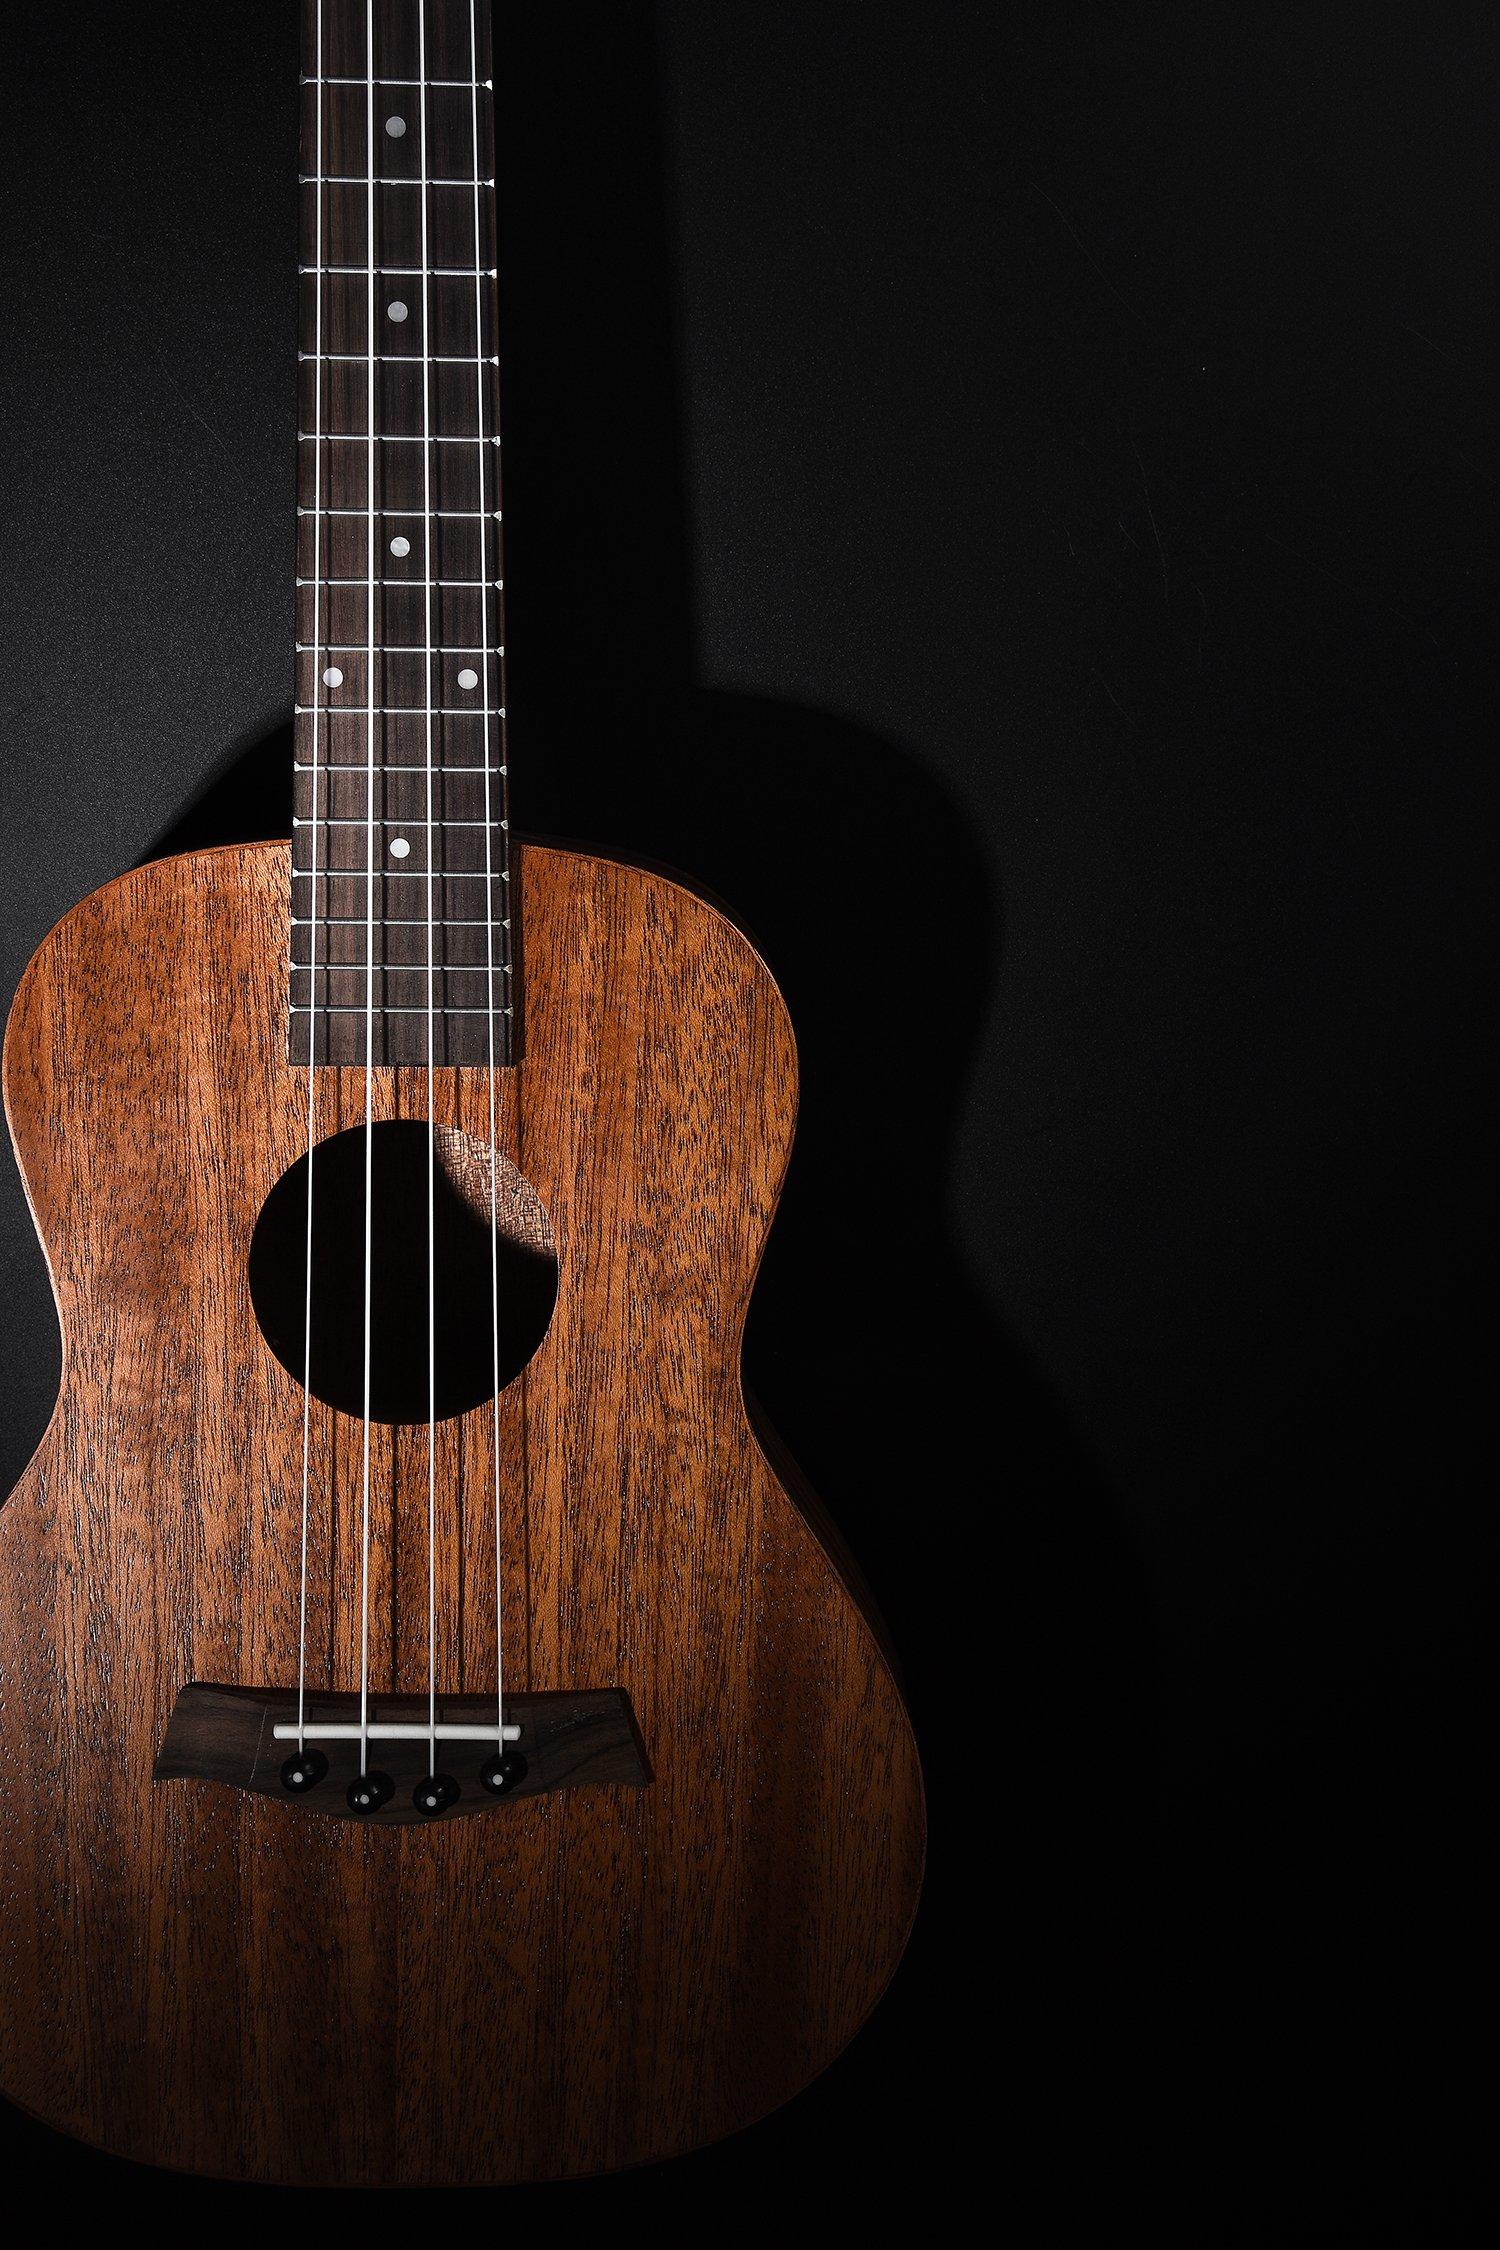 Ortega Guitars RU5CE-BA Baritone Ukulele with Spruce Top and Pickup Sapele Body